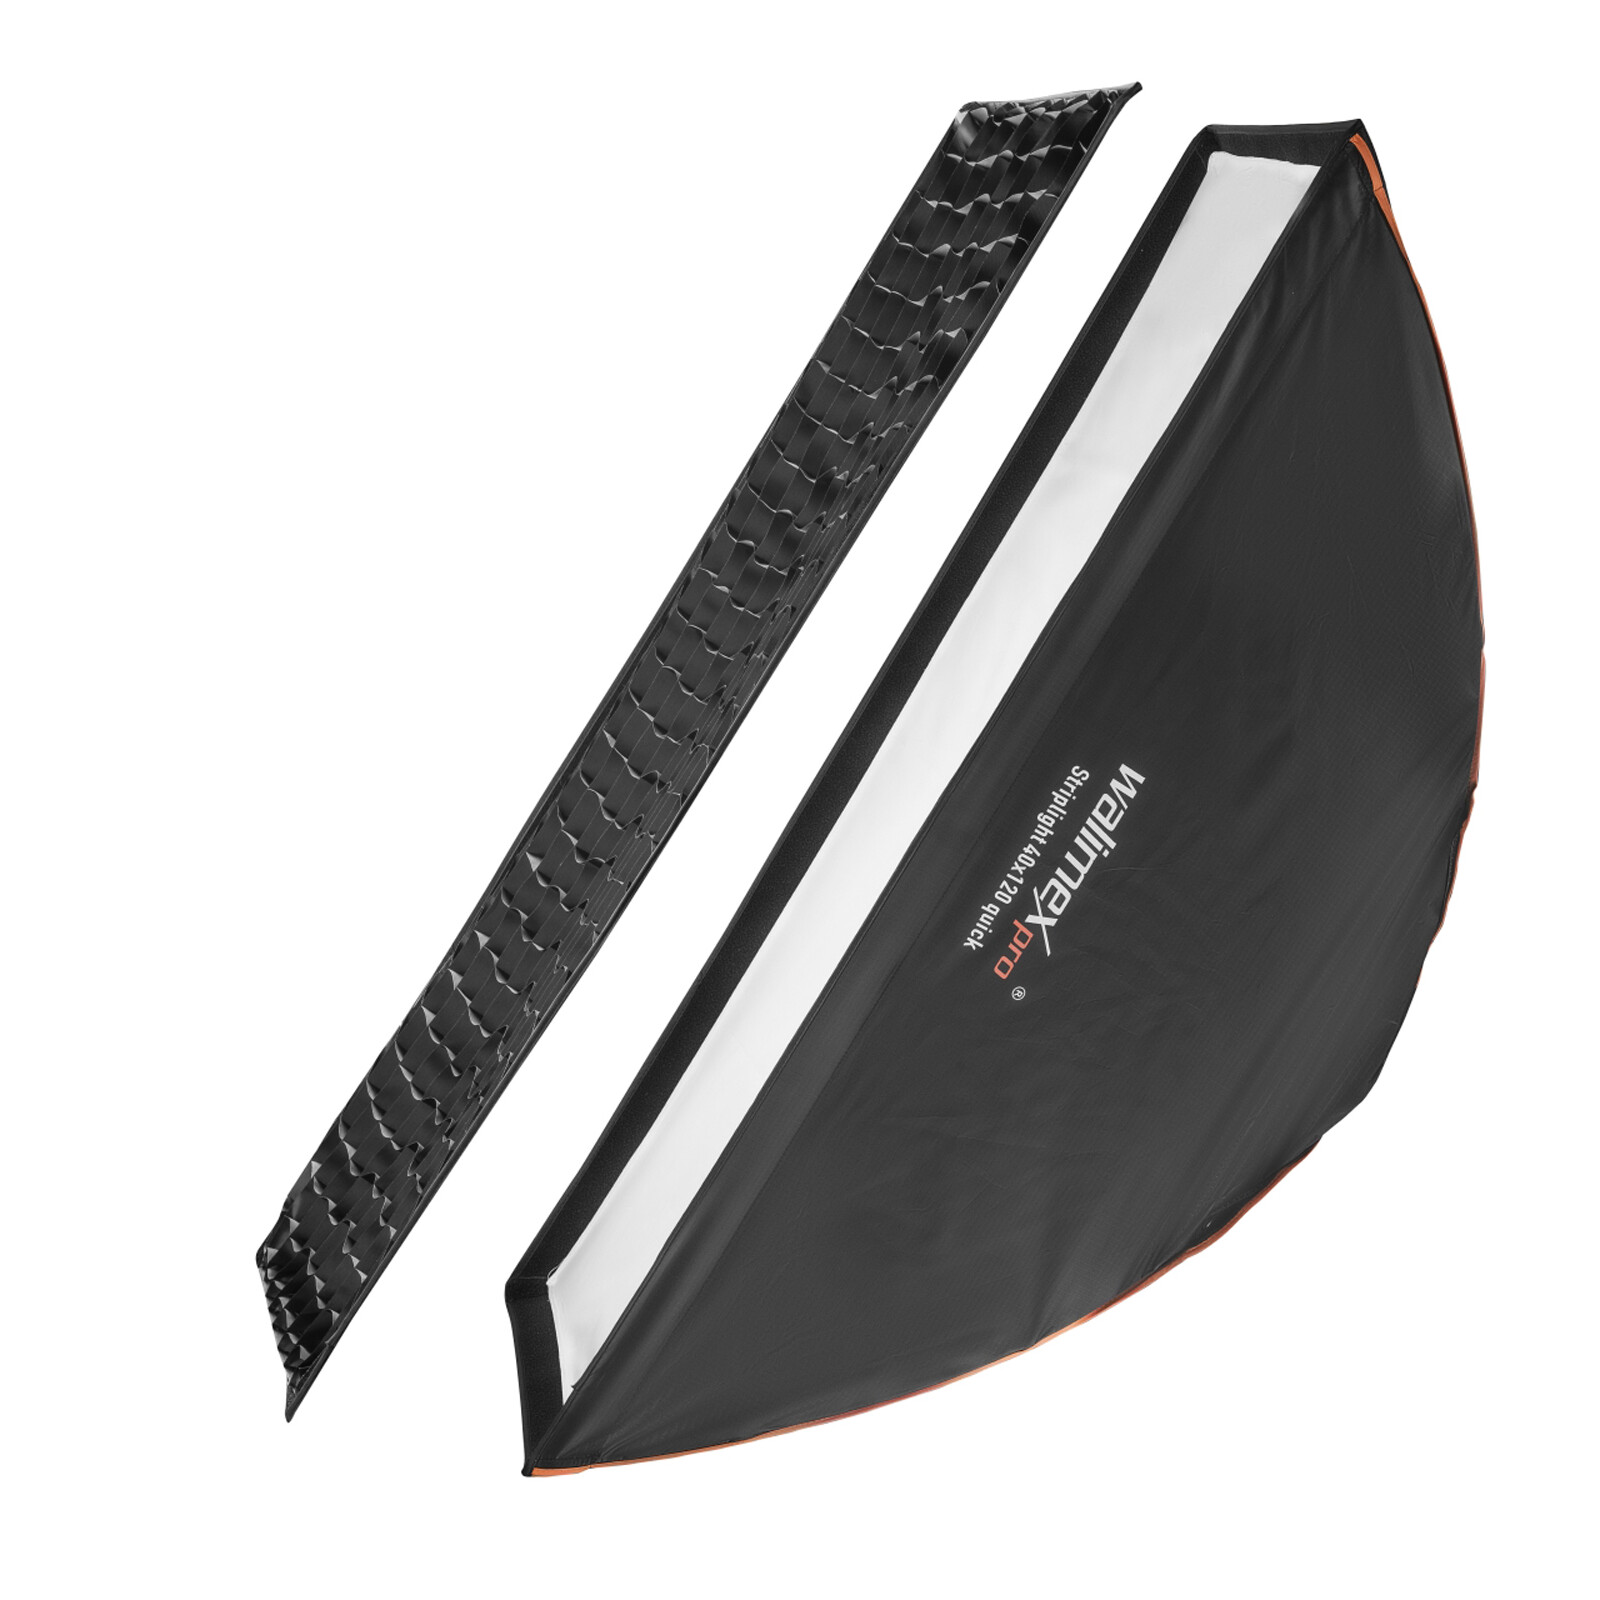 Walimex pro Studio Line Striplight Softbox QA 40x120cm Wali